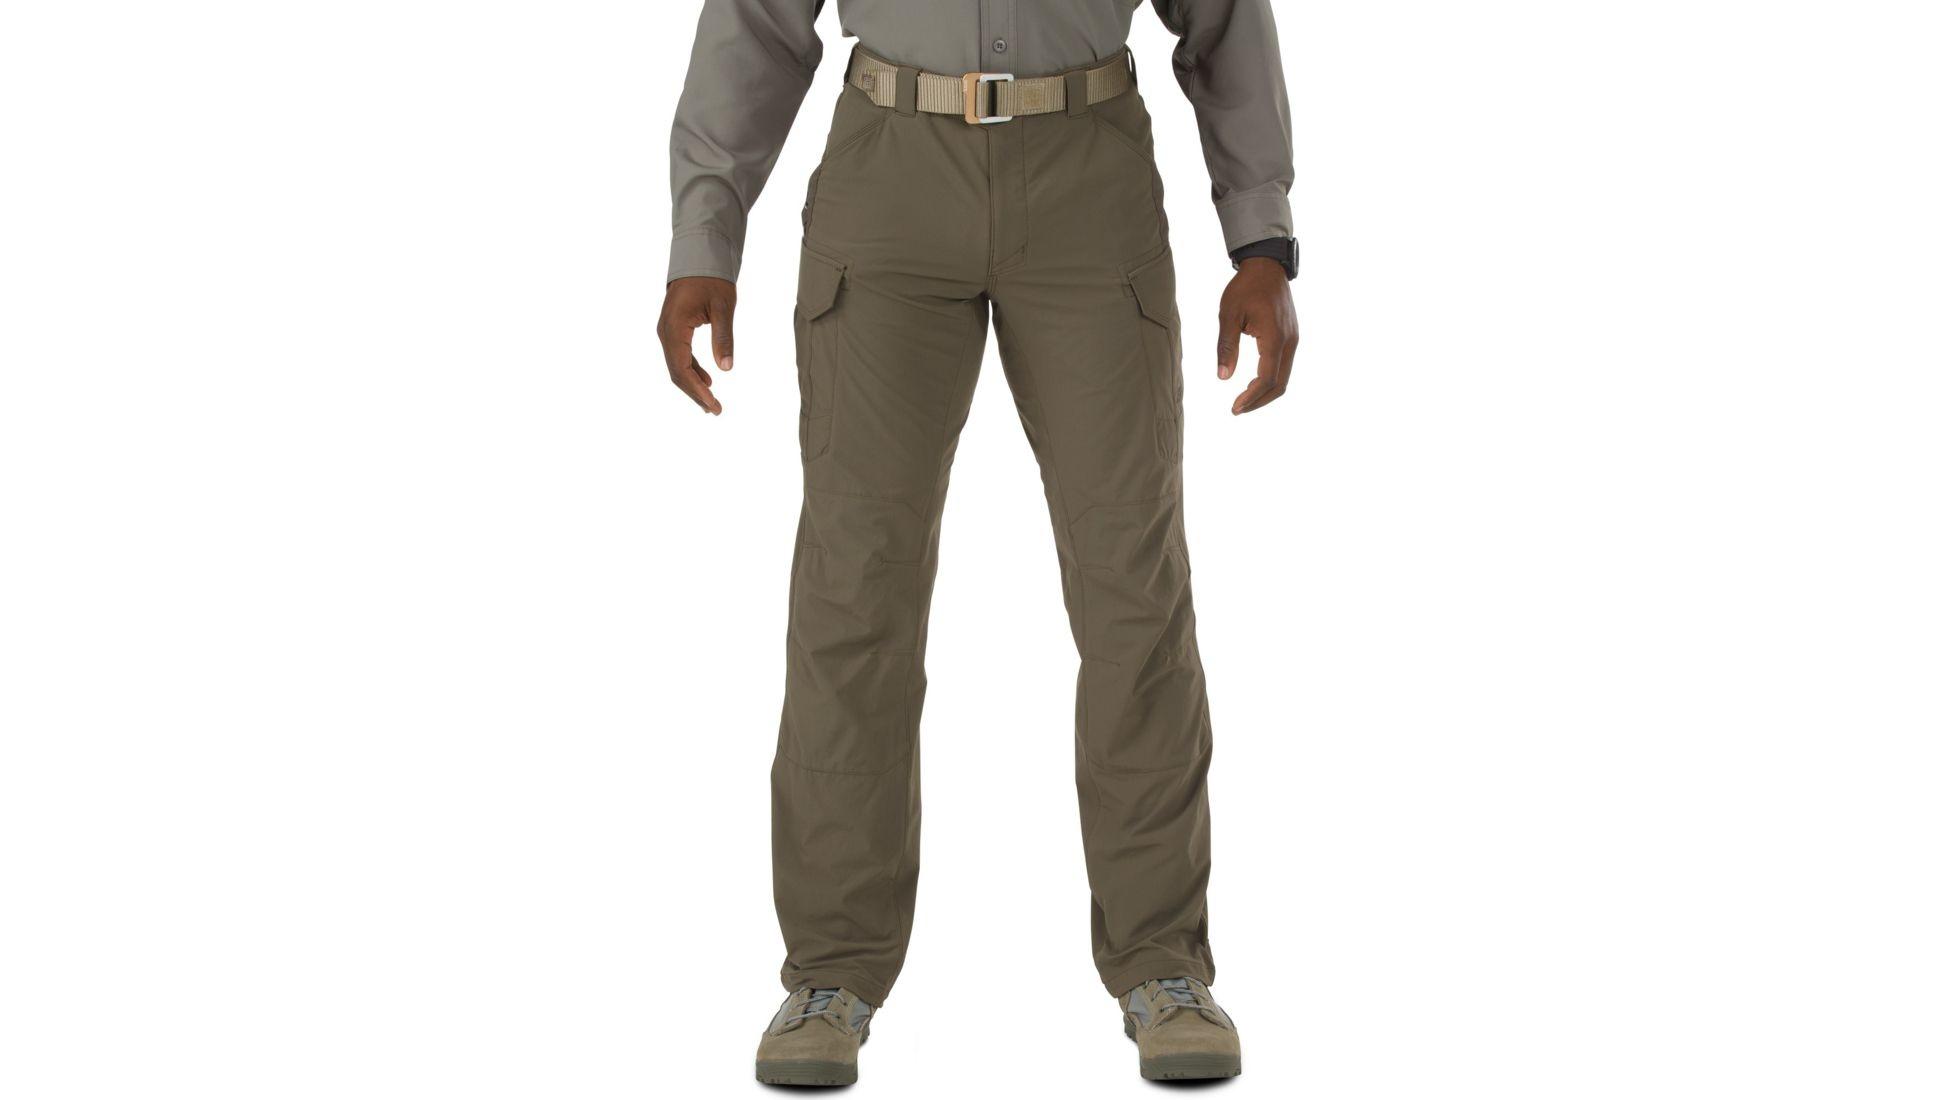 5.11 Tactical 5.11 Tactical Traverse Pant - *Clearance*